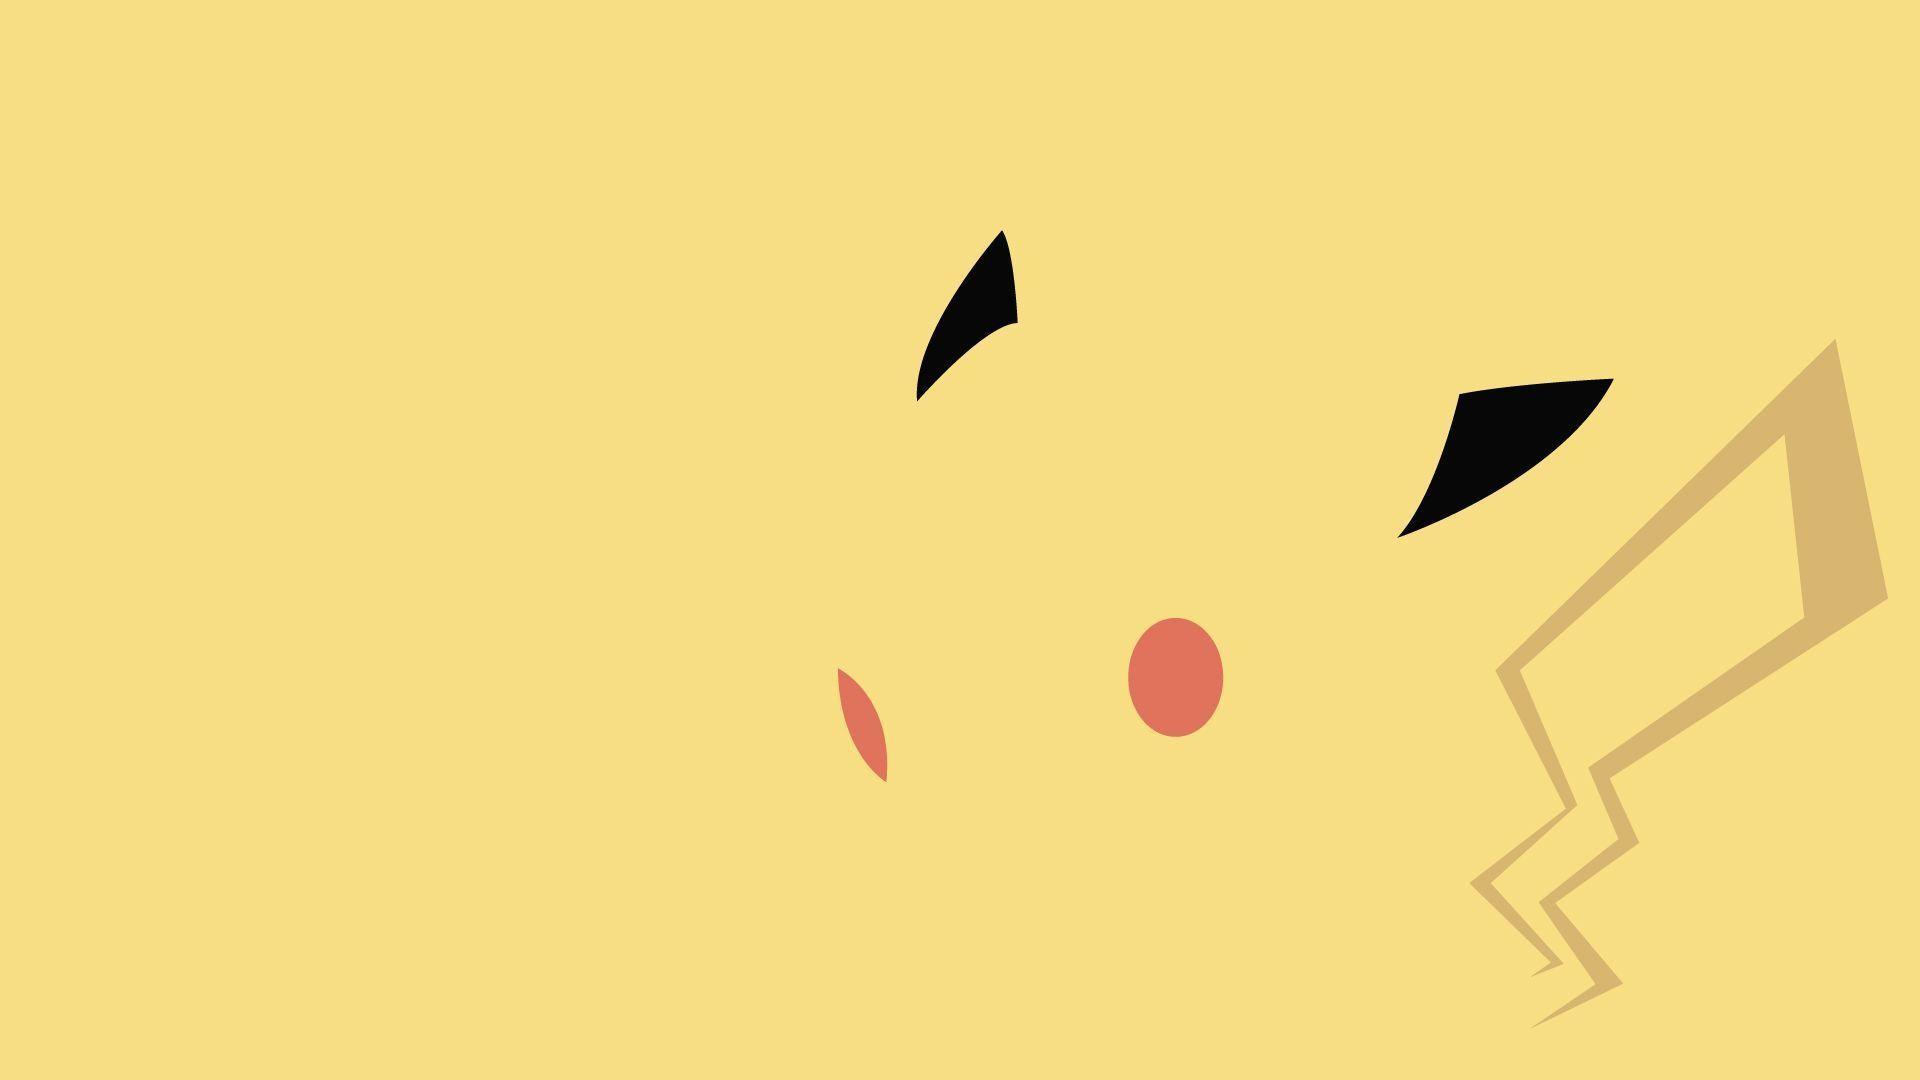 Pokemon Wallpaper Pikachu 26907 Wallpapers HD   colourinwallpaper.